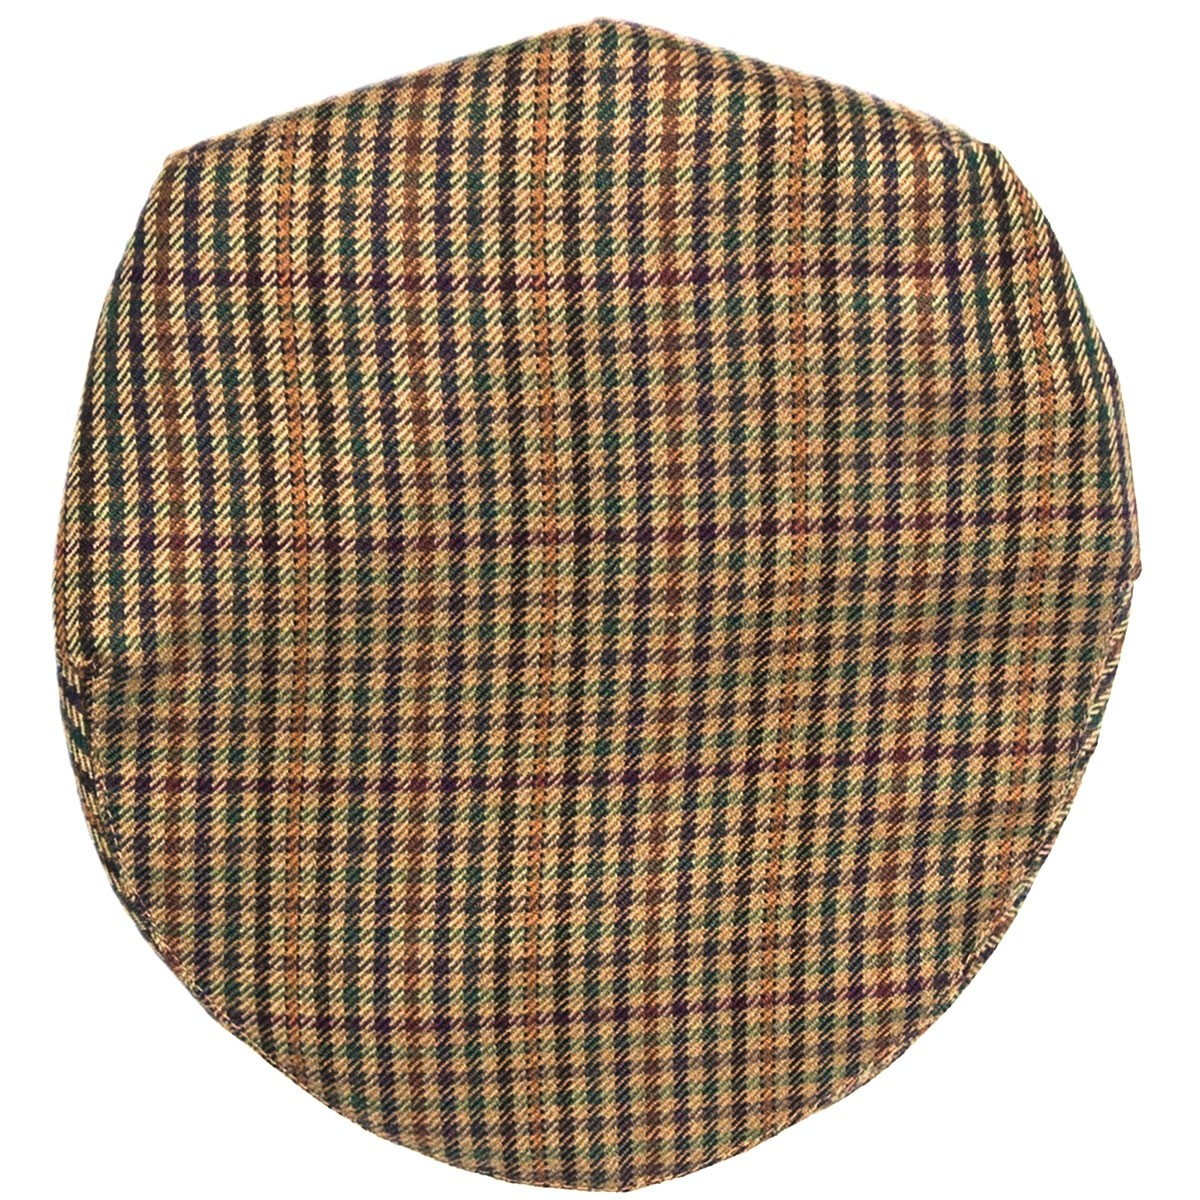 Ednam Check Tweed Barnton Flat Cap